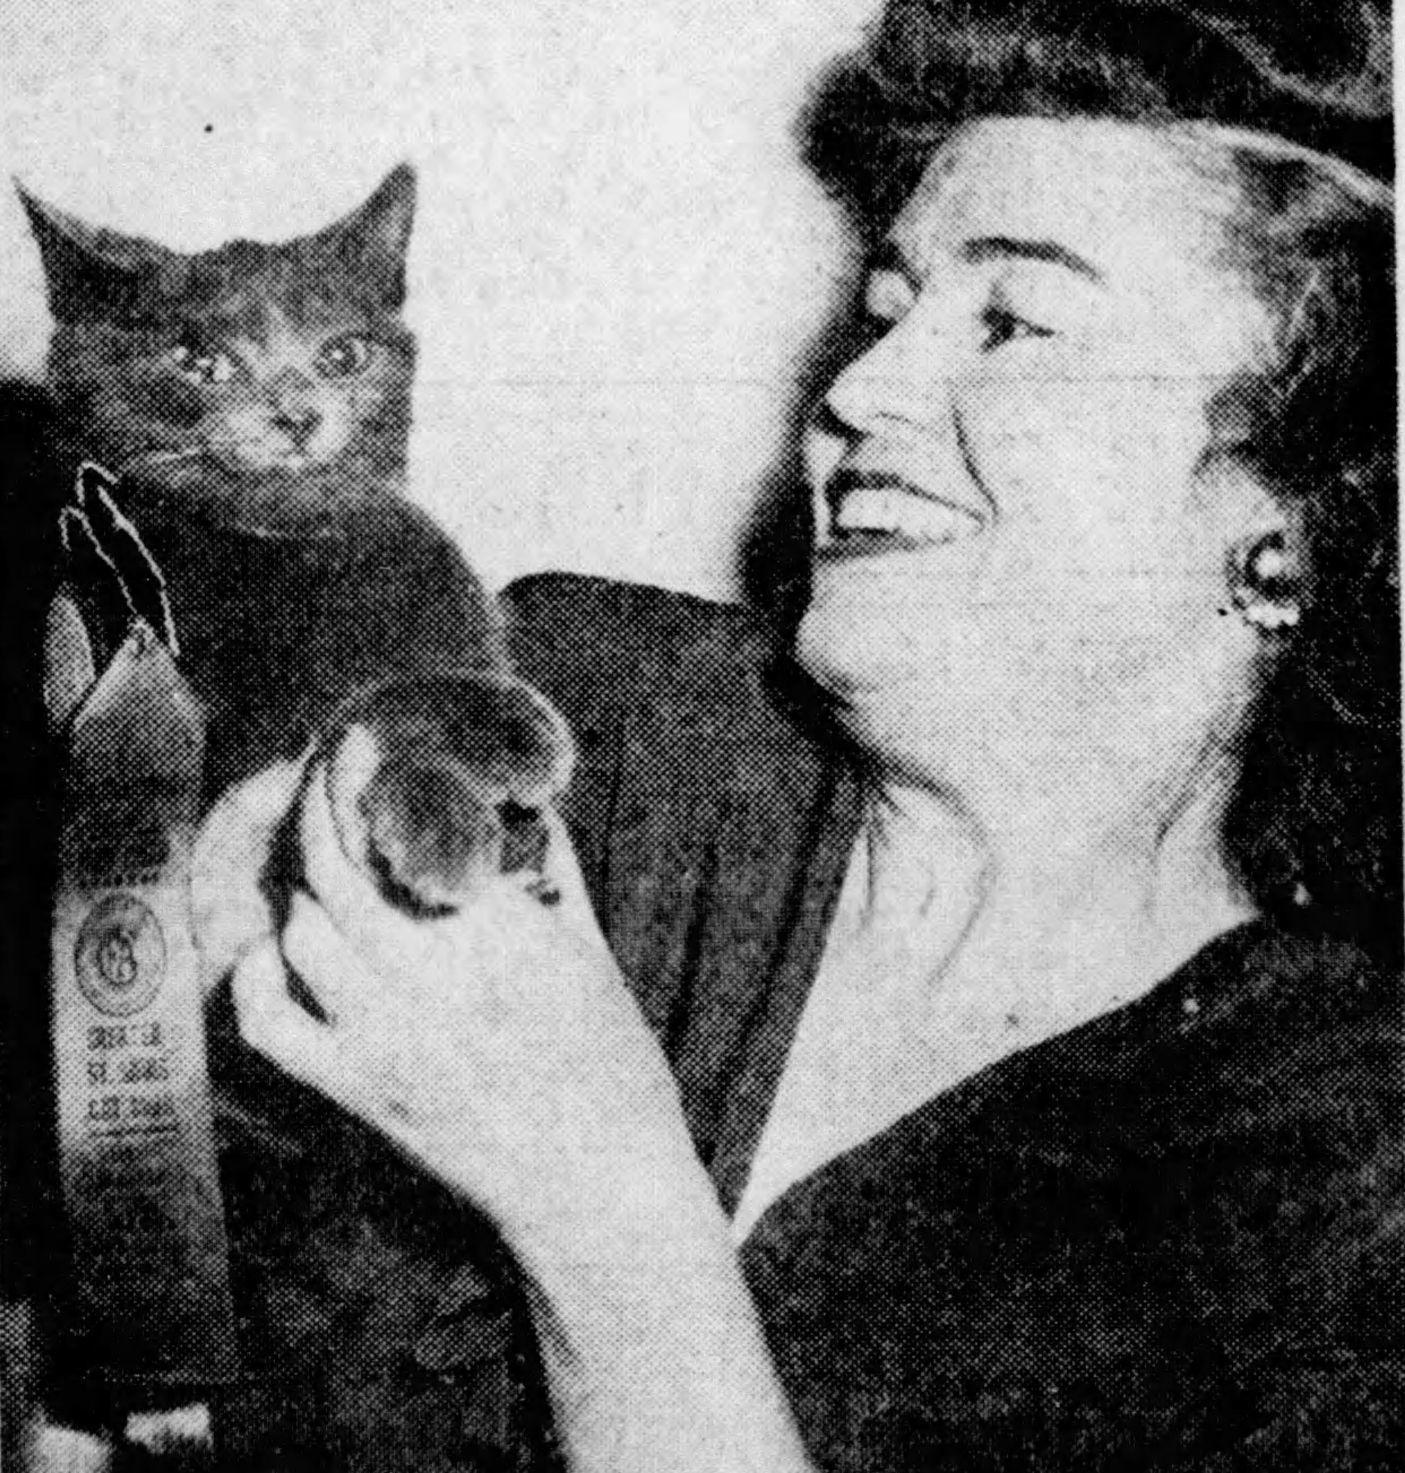 Stray Cat Wins Cat Show Award in 1947